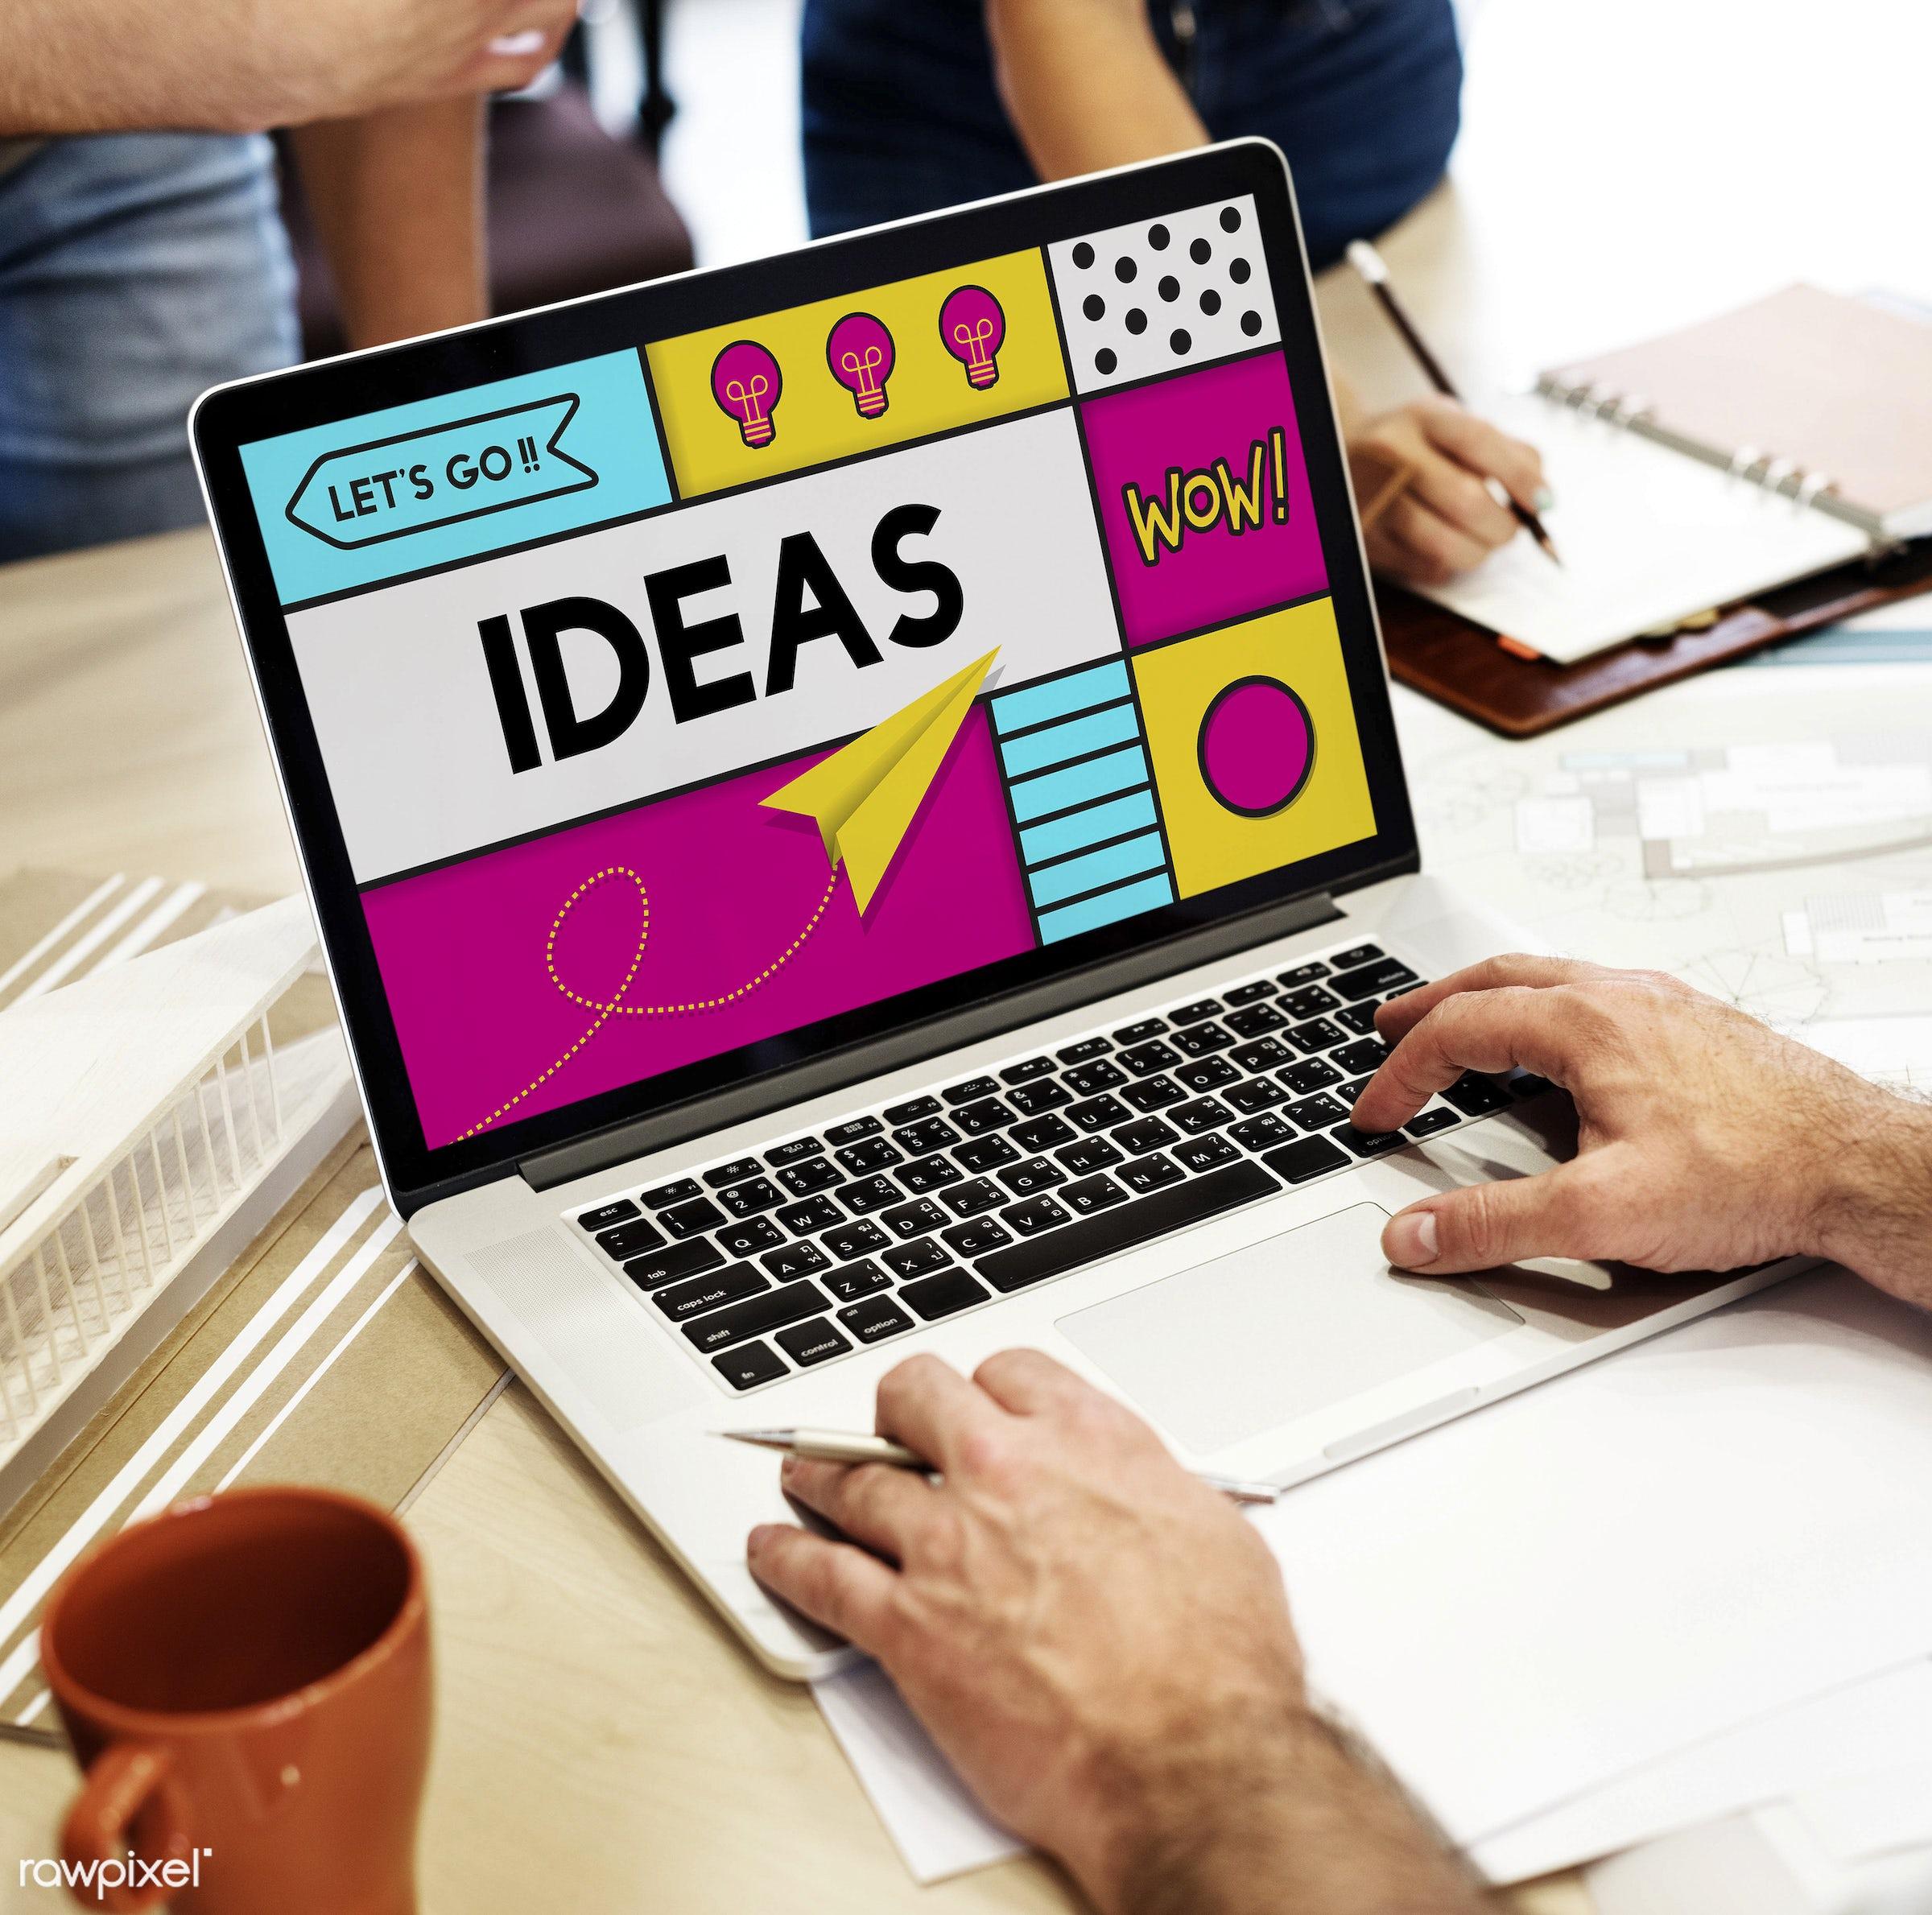 architect, architecture, art, be creative, blueprint, coffee, coffee cup, concept, creativity, cup, design, device, digital...